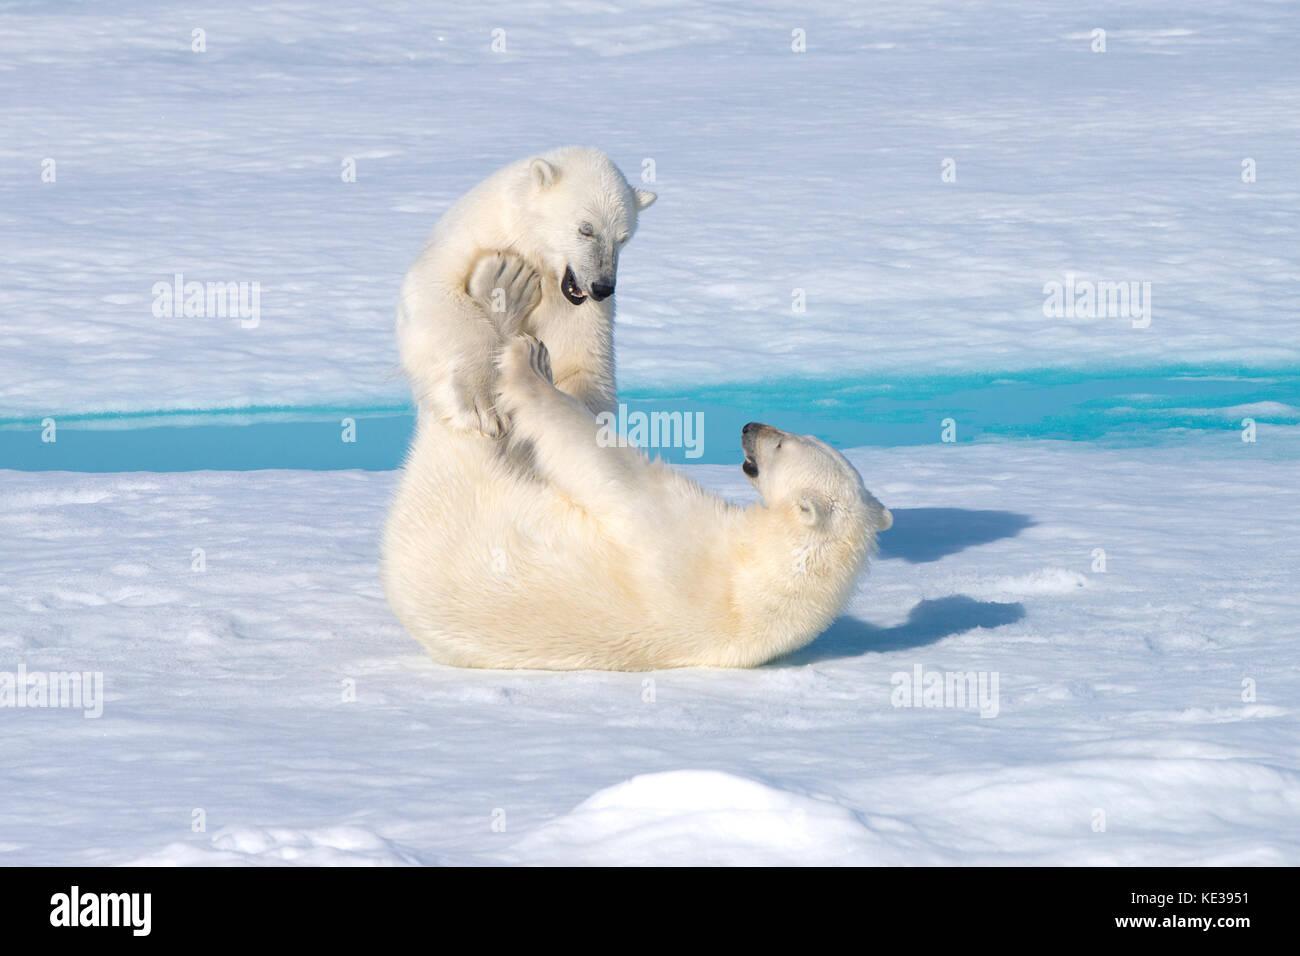 Two-year old polar bear cubs (Ursus Maritimus) playing, Svalbard Archipelago, Norwegian Arctic, - Stock Image